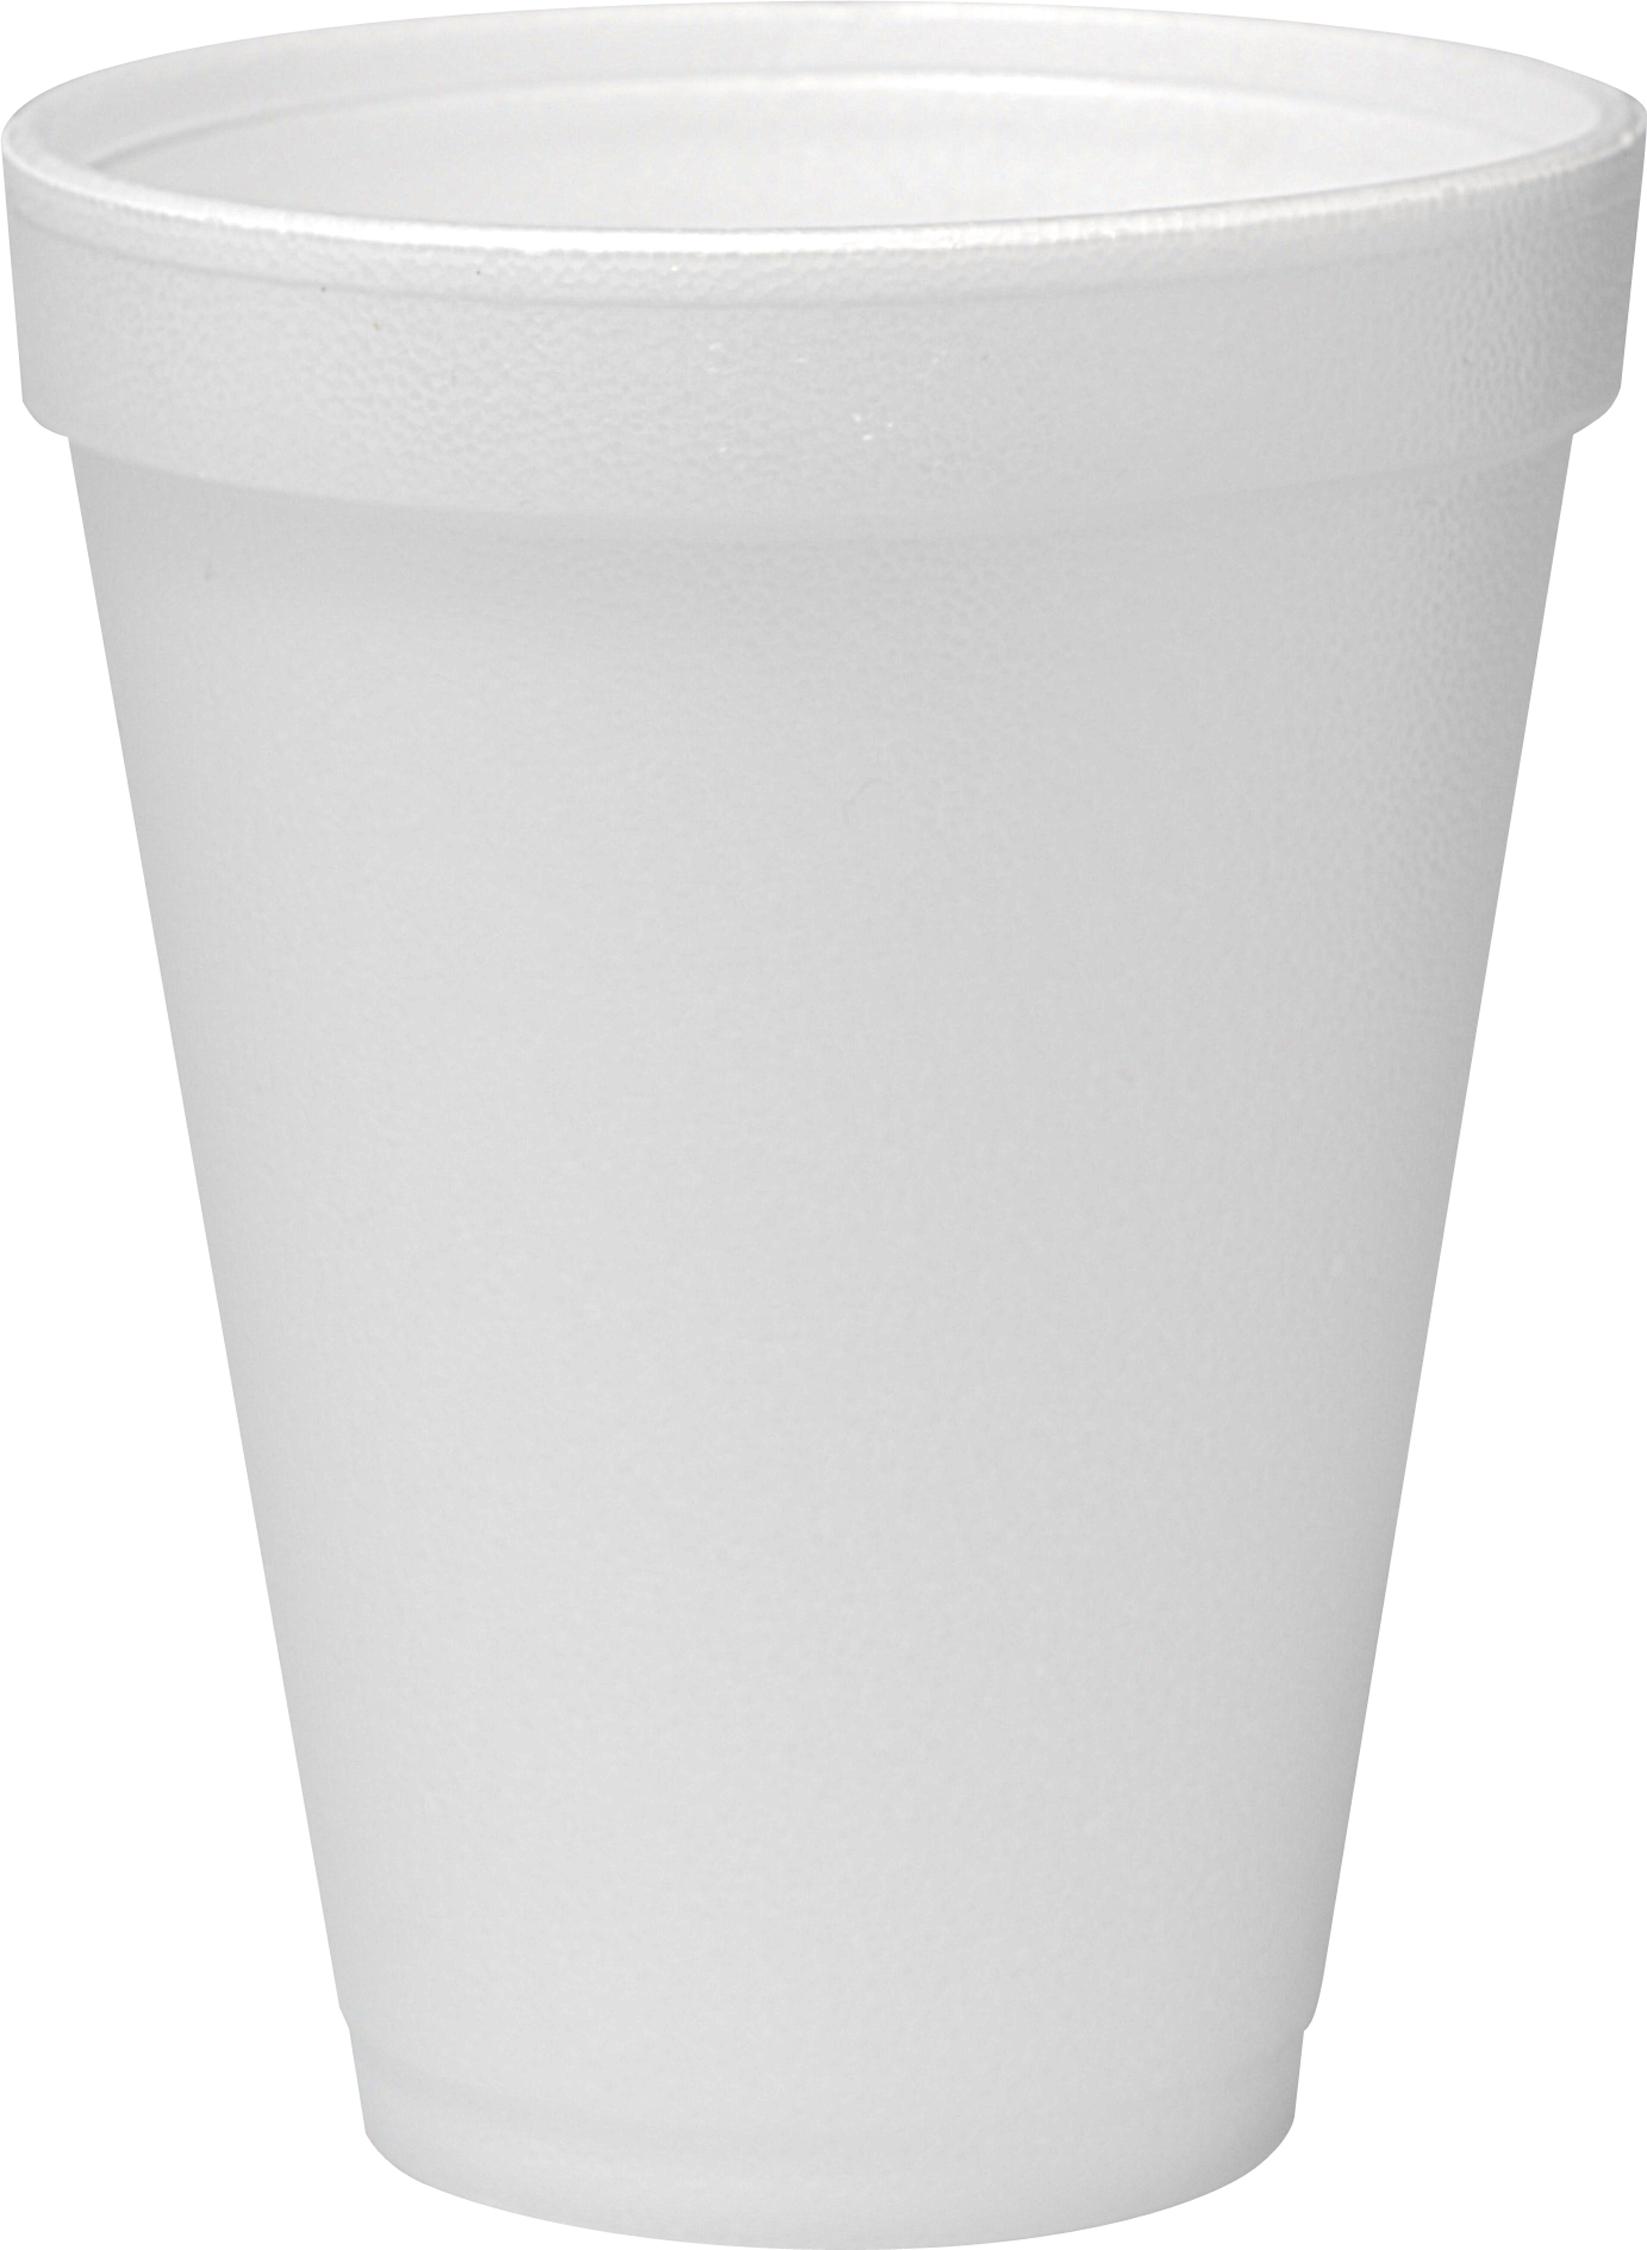 Plastic clipart styrofoam cup #11